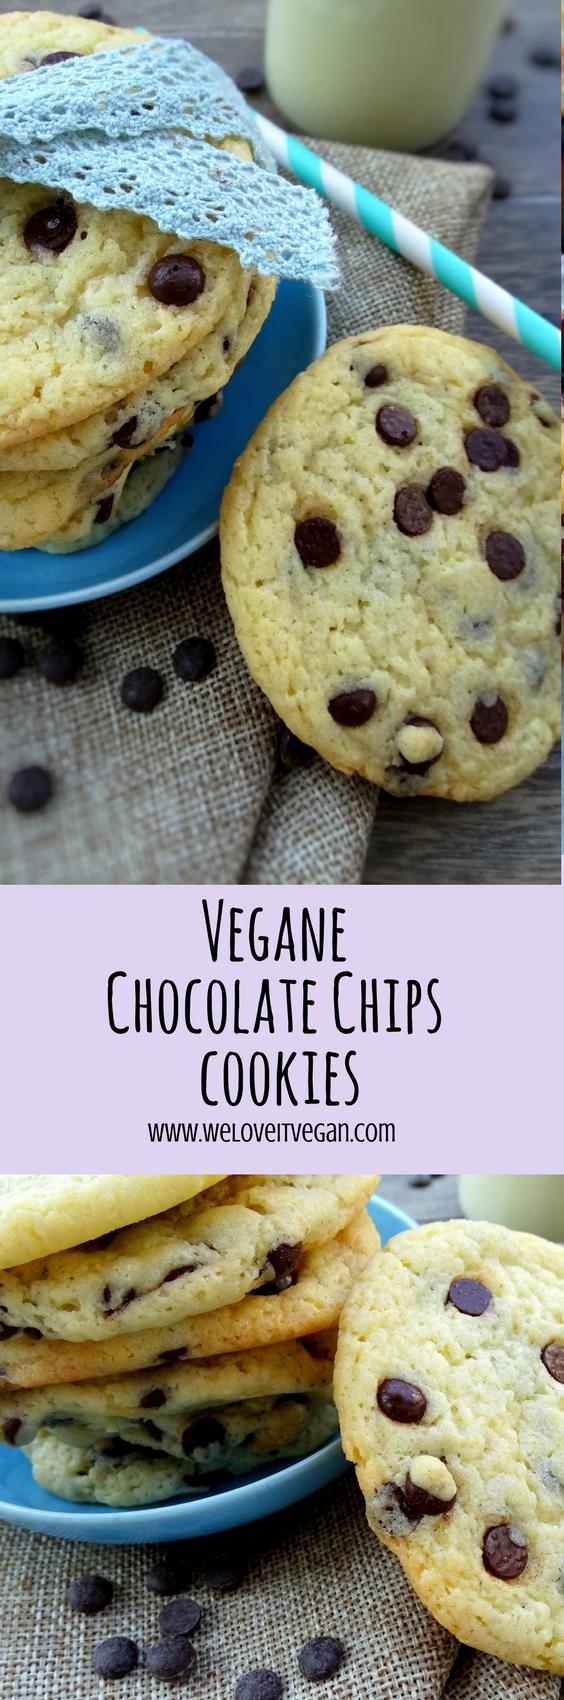 Vegane Chocolate Chips Cookies